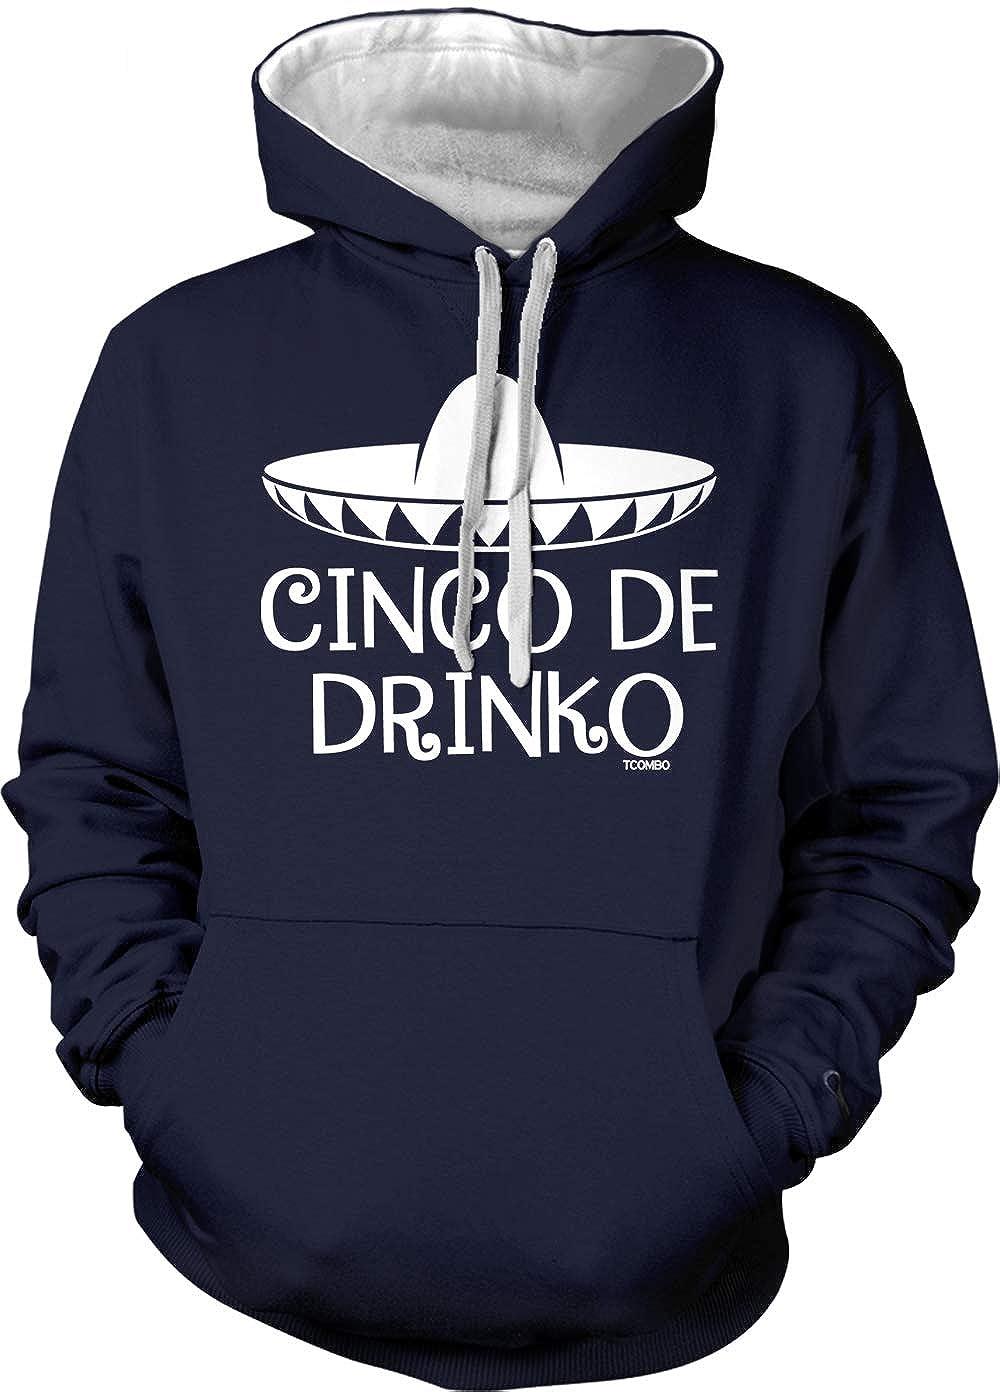 Sombrero Drinking May 5th Unisex Hoodie Sweatshirt Cinco De Drinko